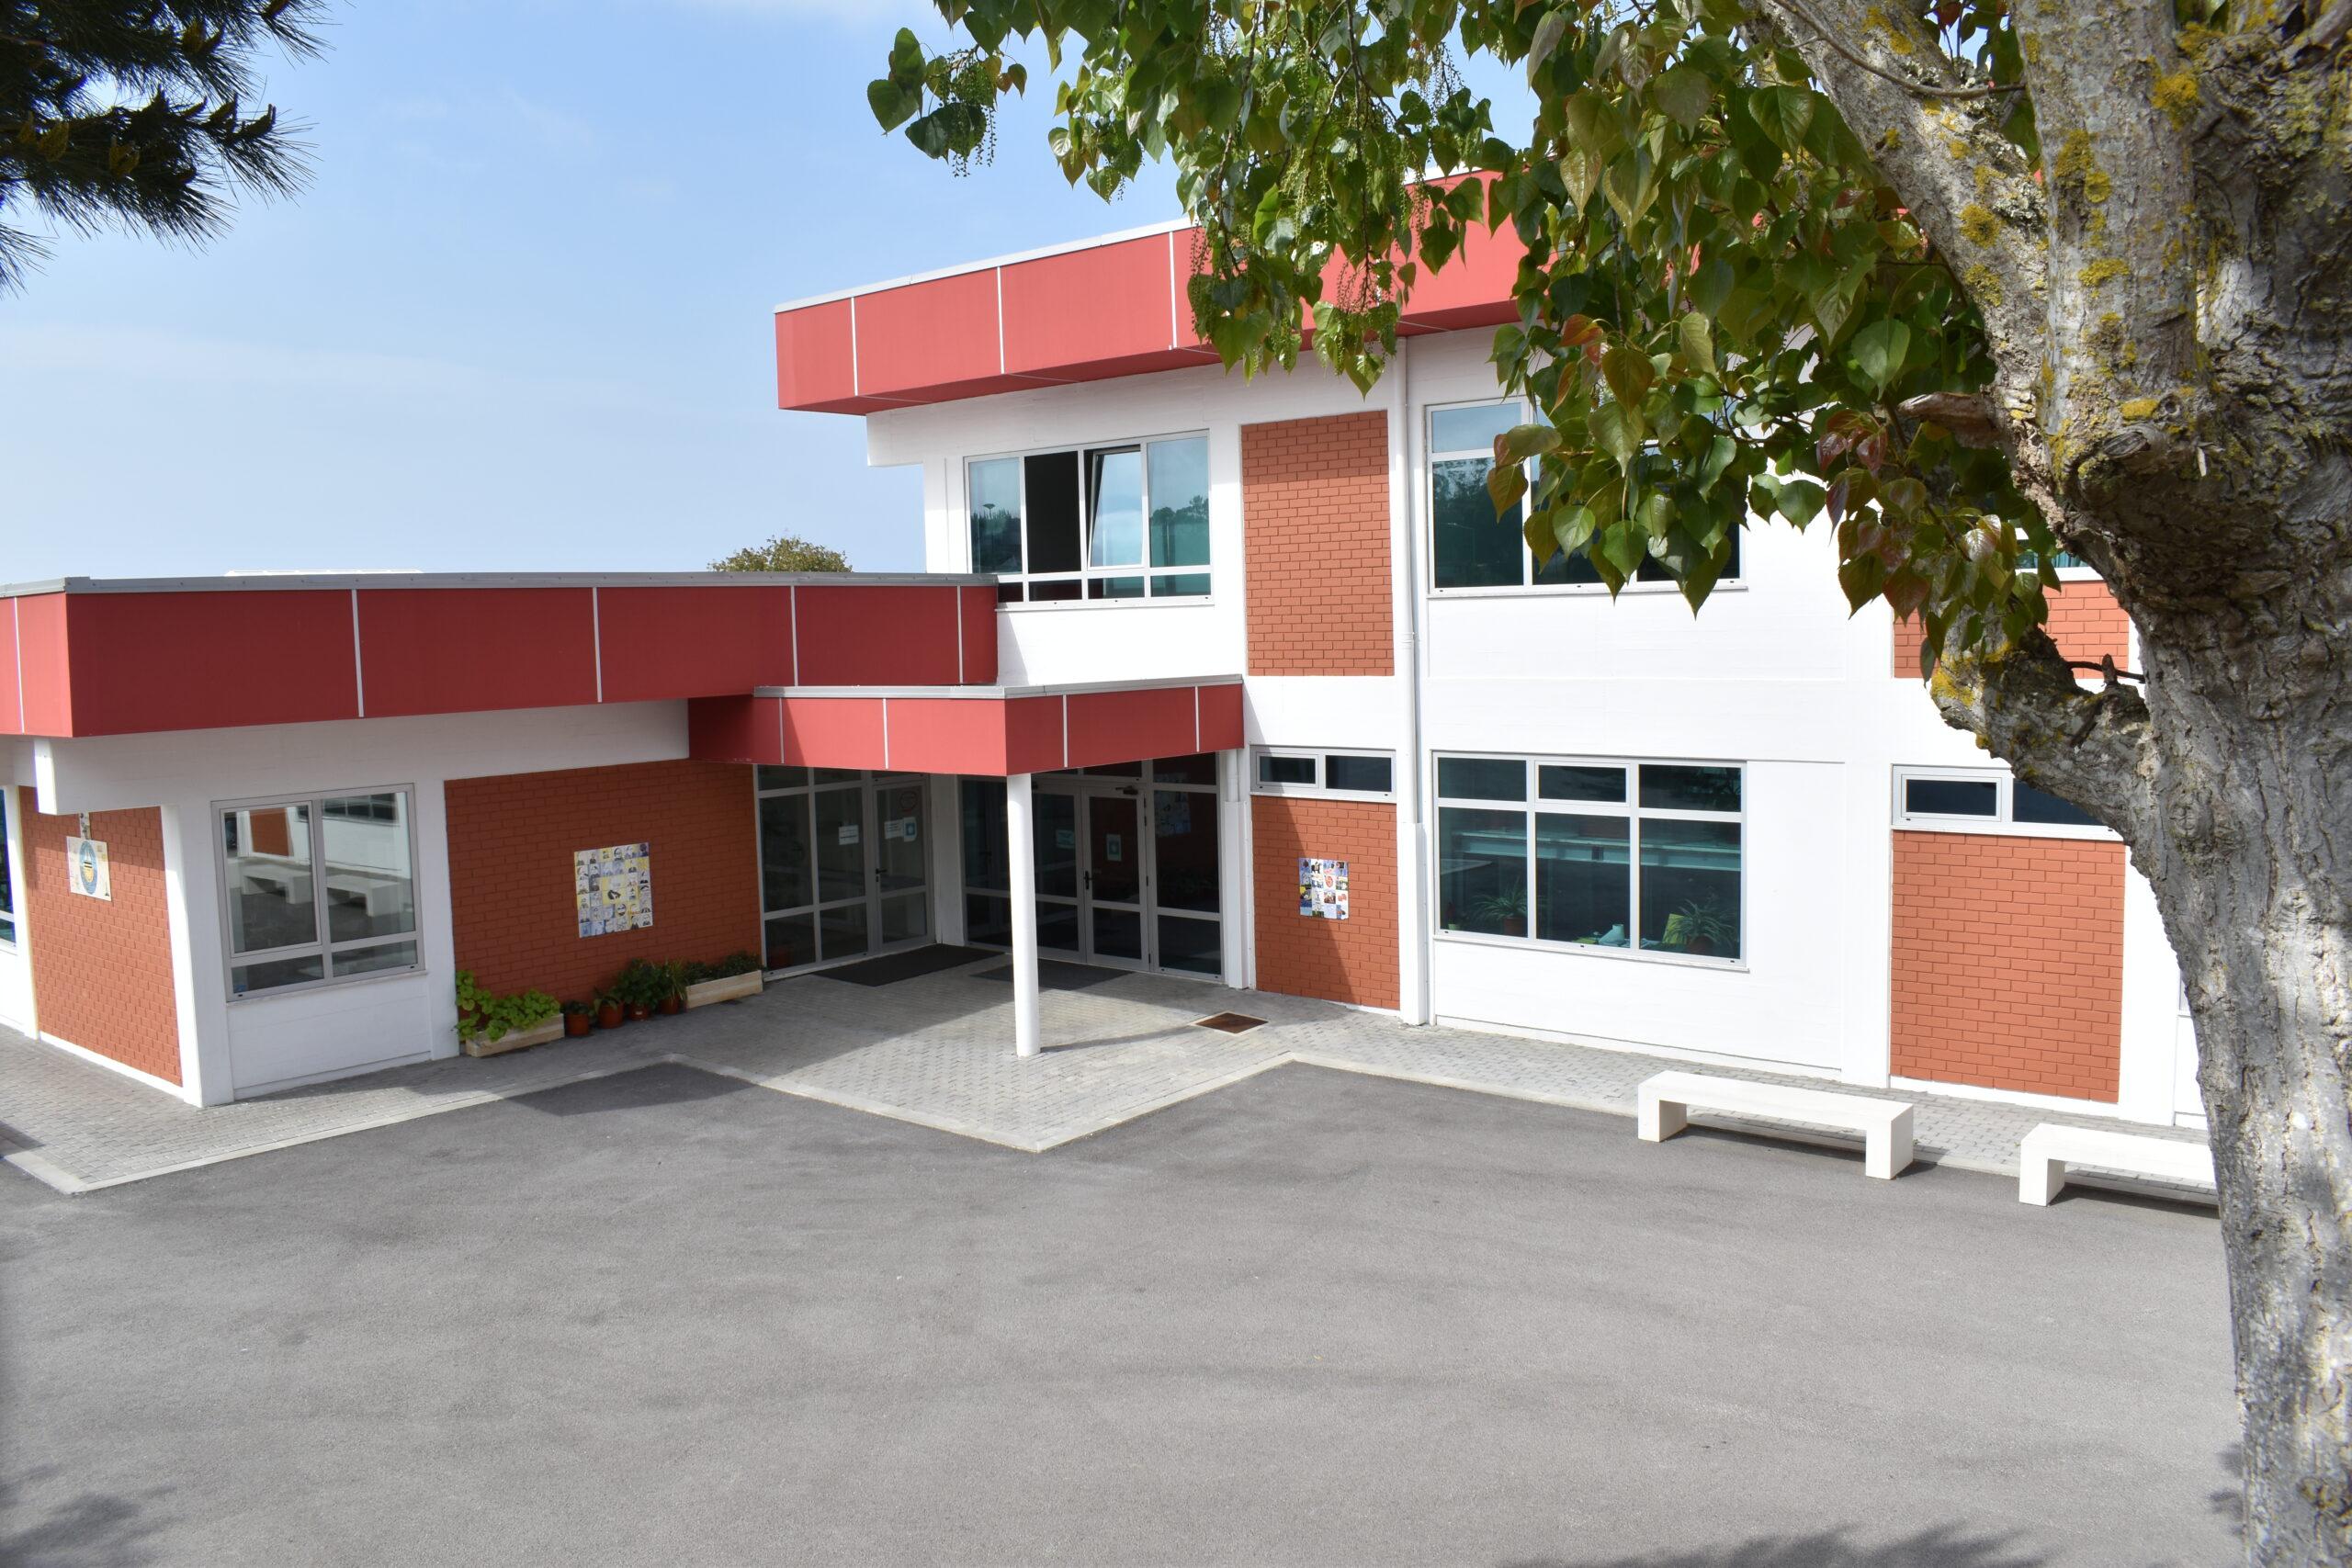 School Antonio Bento Franco, in Ericeira